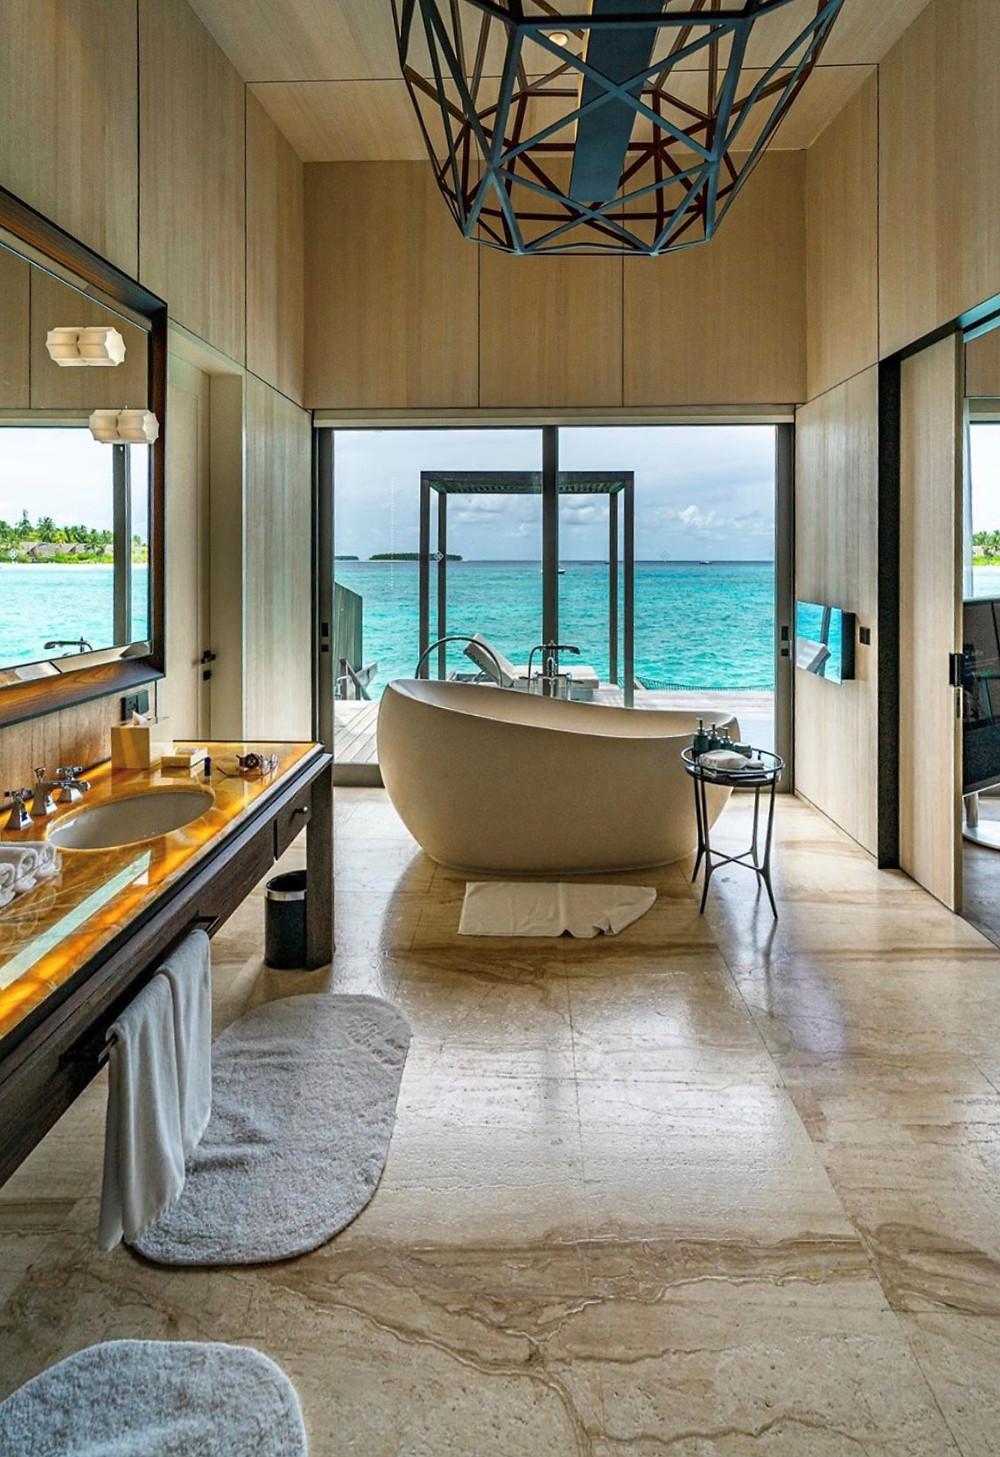 Overwater Bungalow Bathroom with Ocean Views